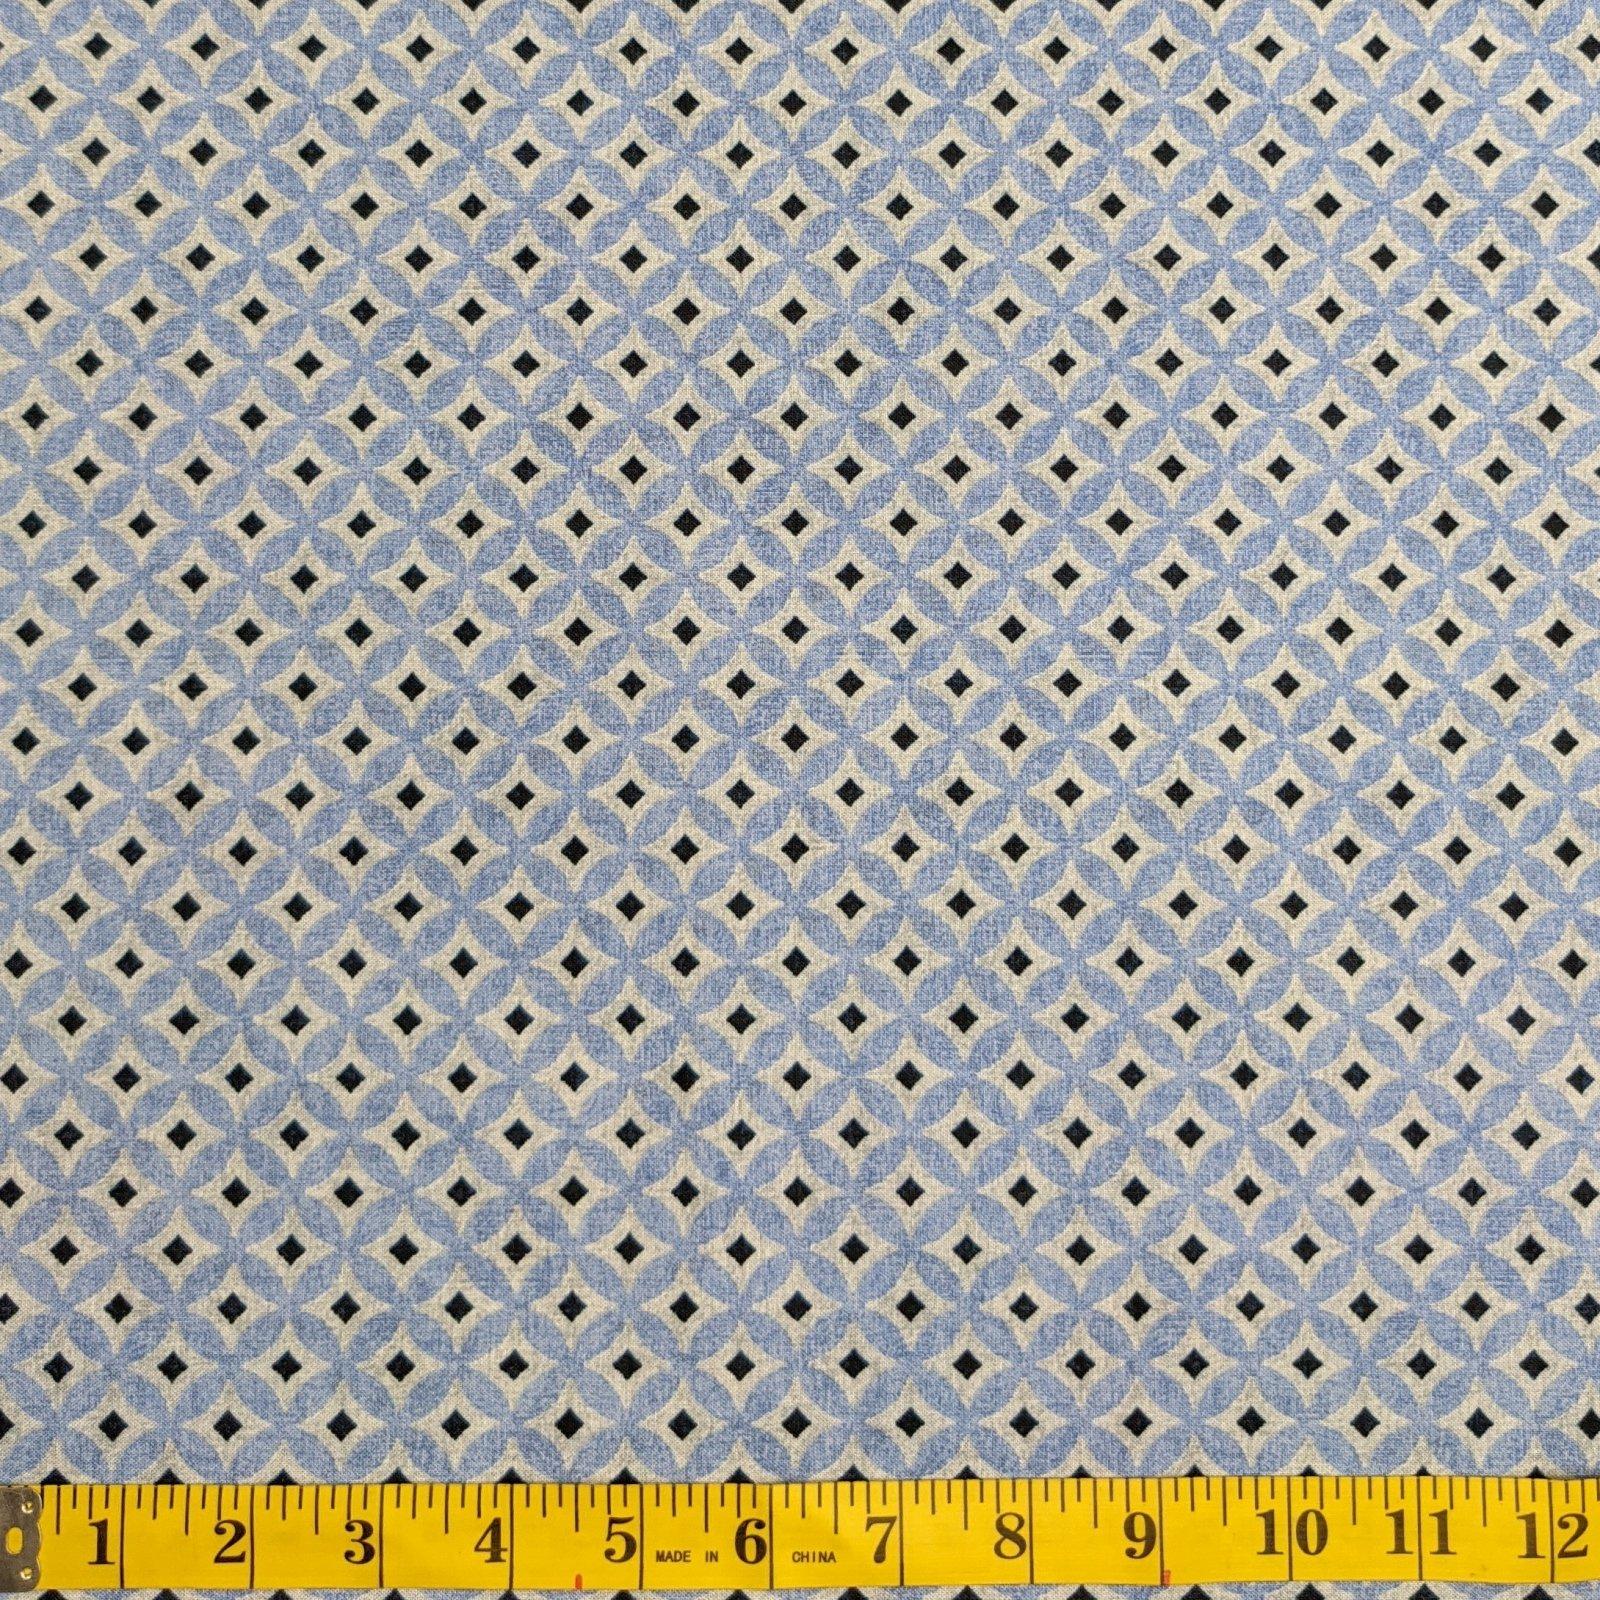 Stof Fabrics - Retro Vibes 4500 464